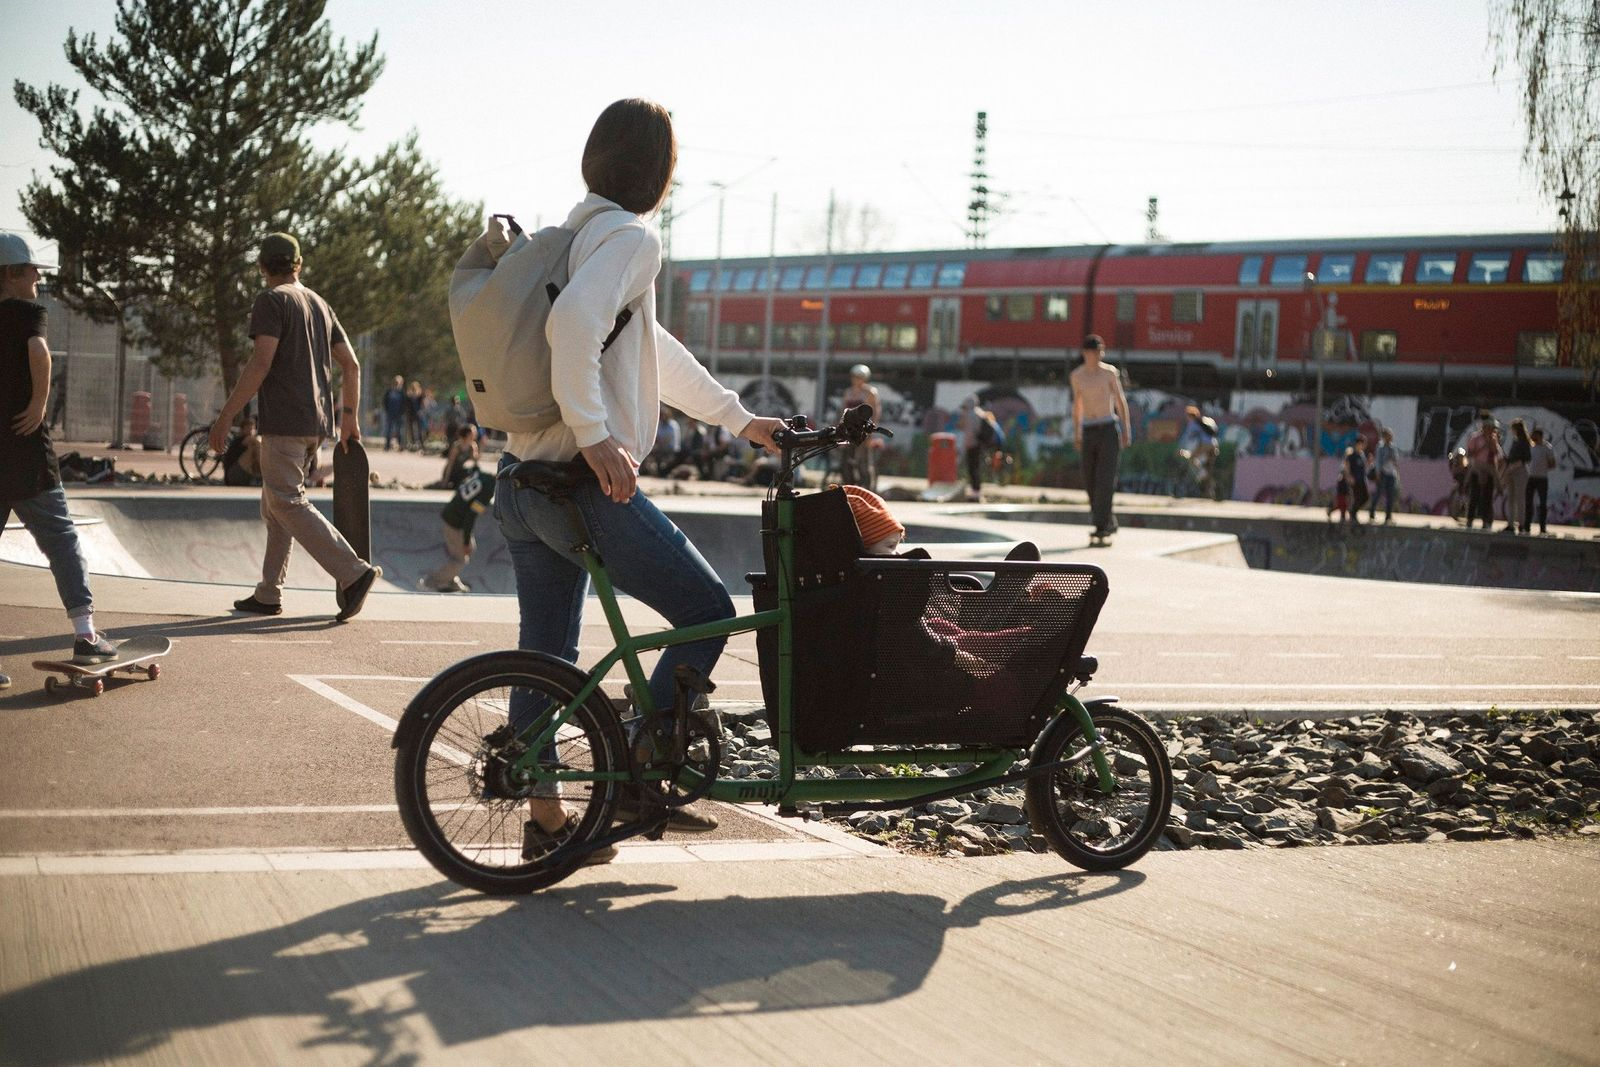 muli-cycles / Lastenrad / Muli